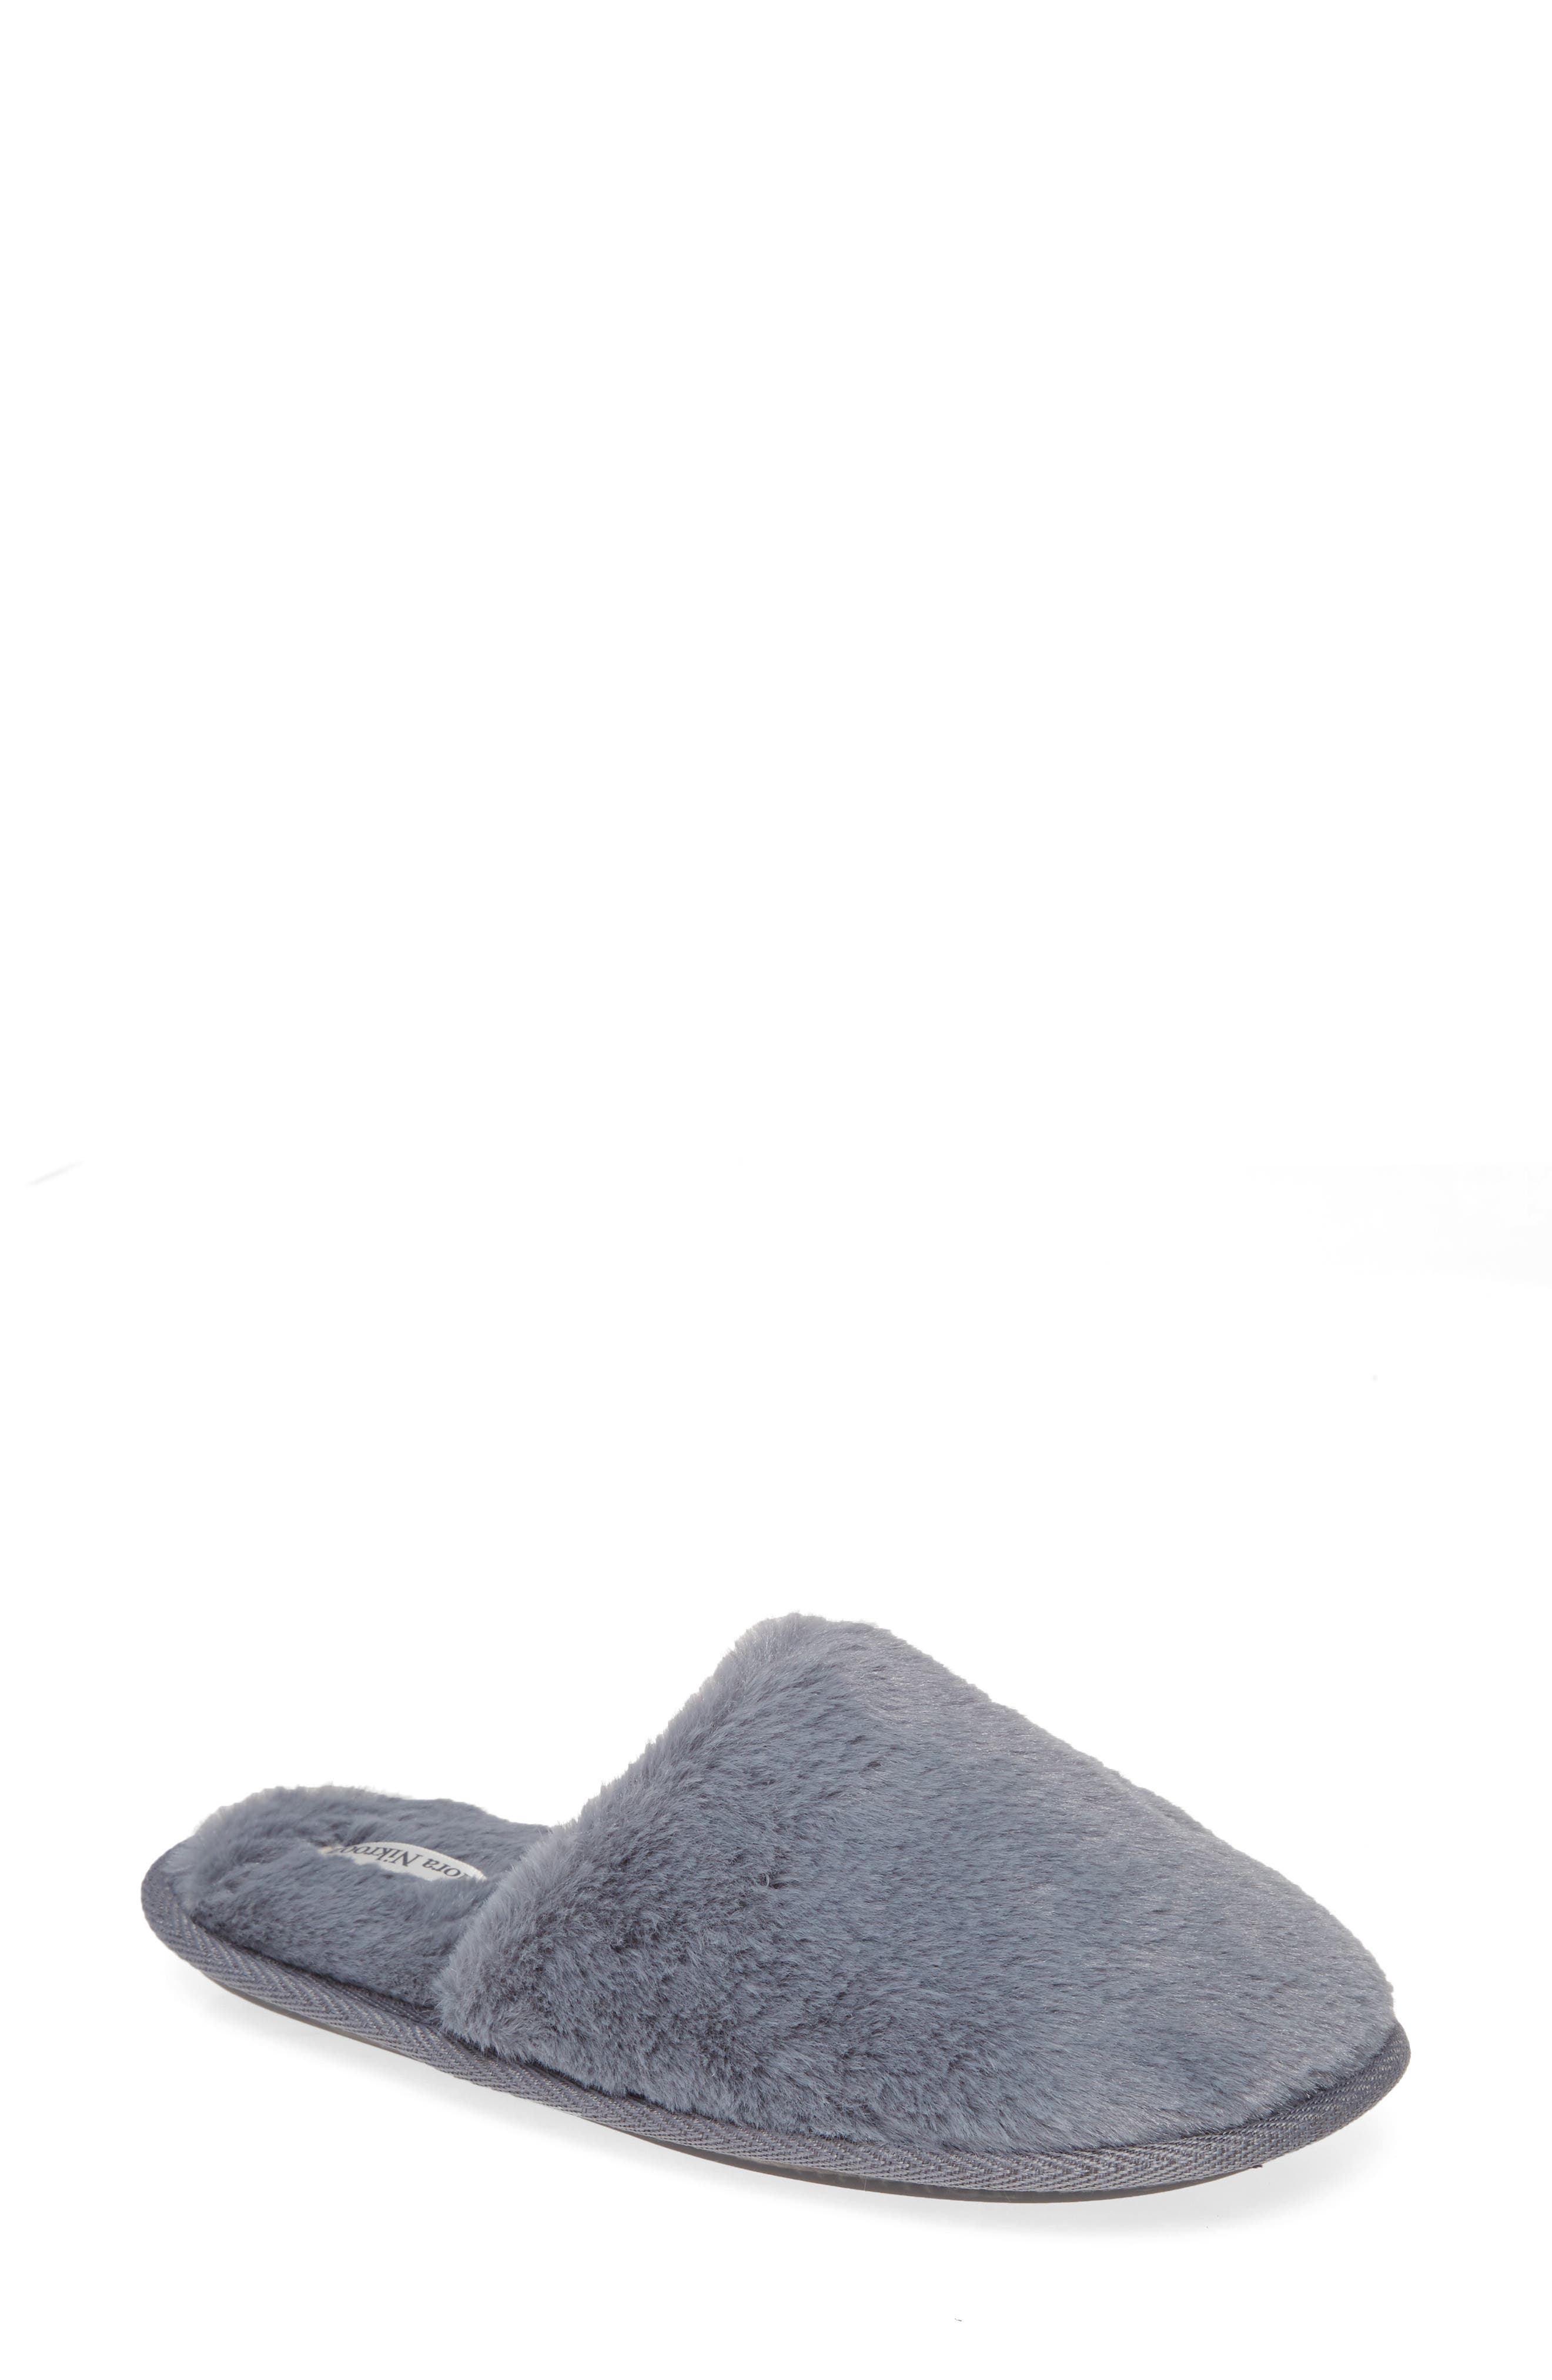 Women's Slippers: Sale | Nordstrom